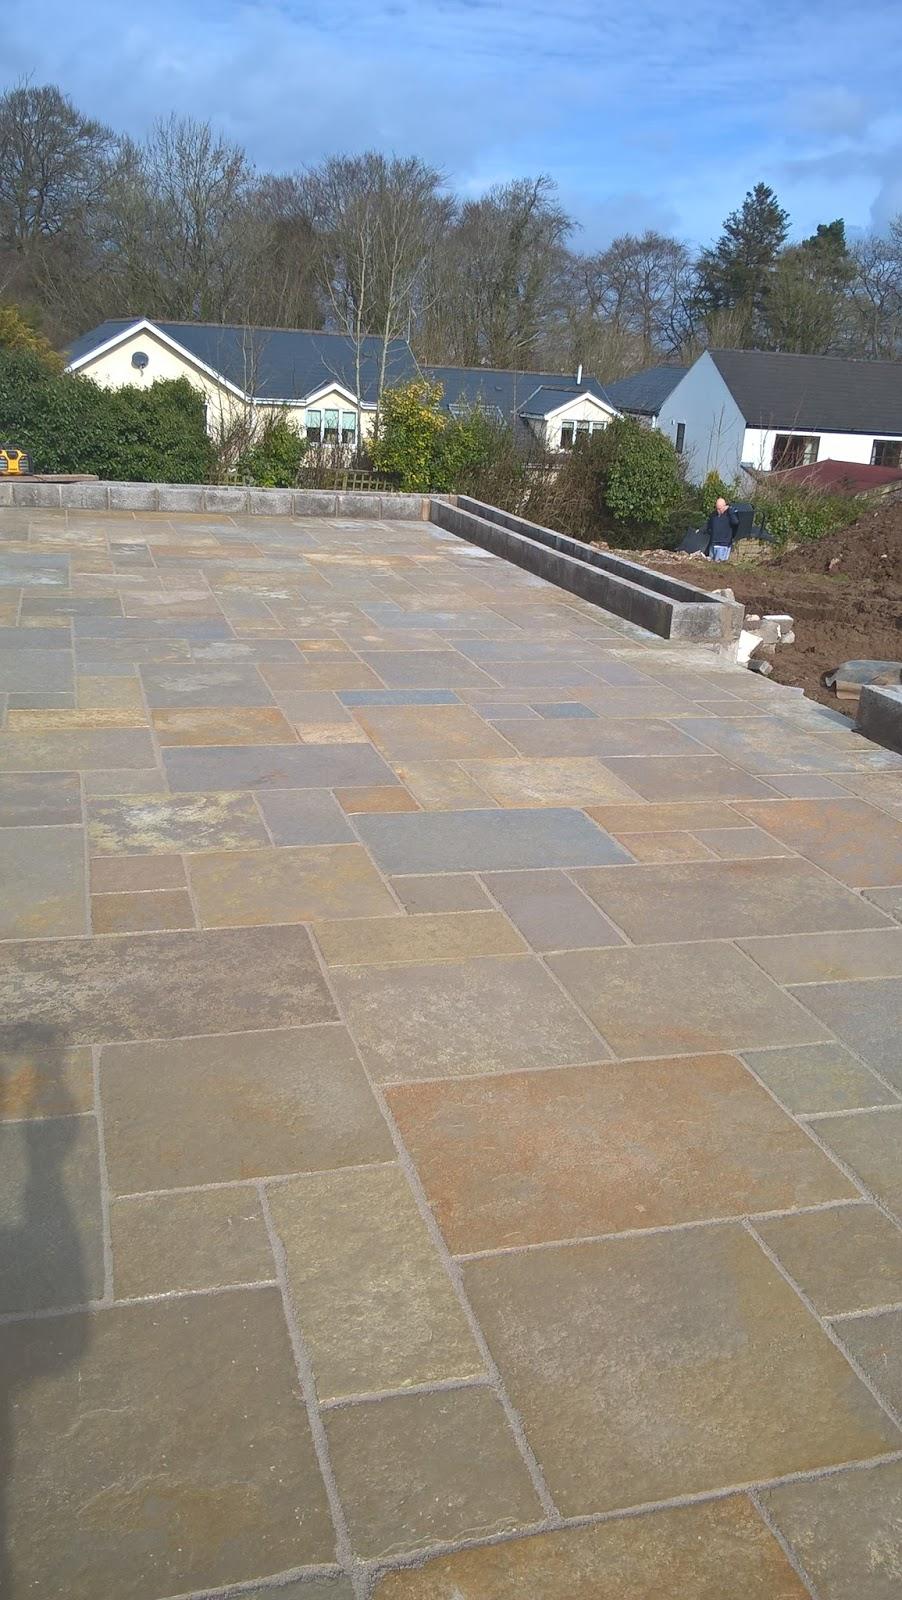 Raised Patio With Steps: CWM LLYNFI BRICKLAYING : Raised Limestone Patio With